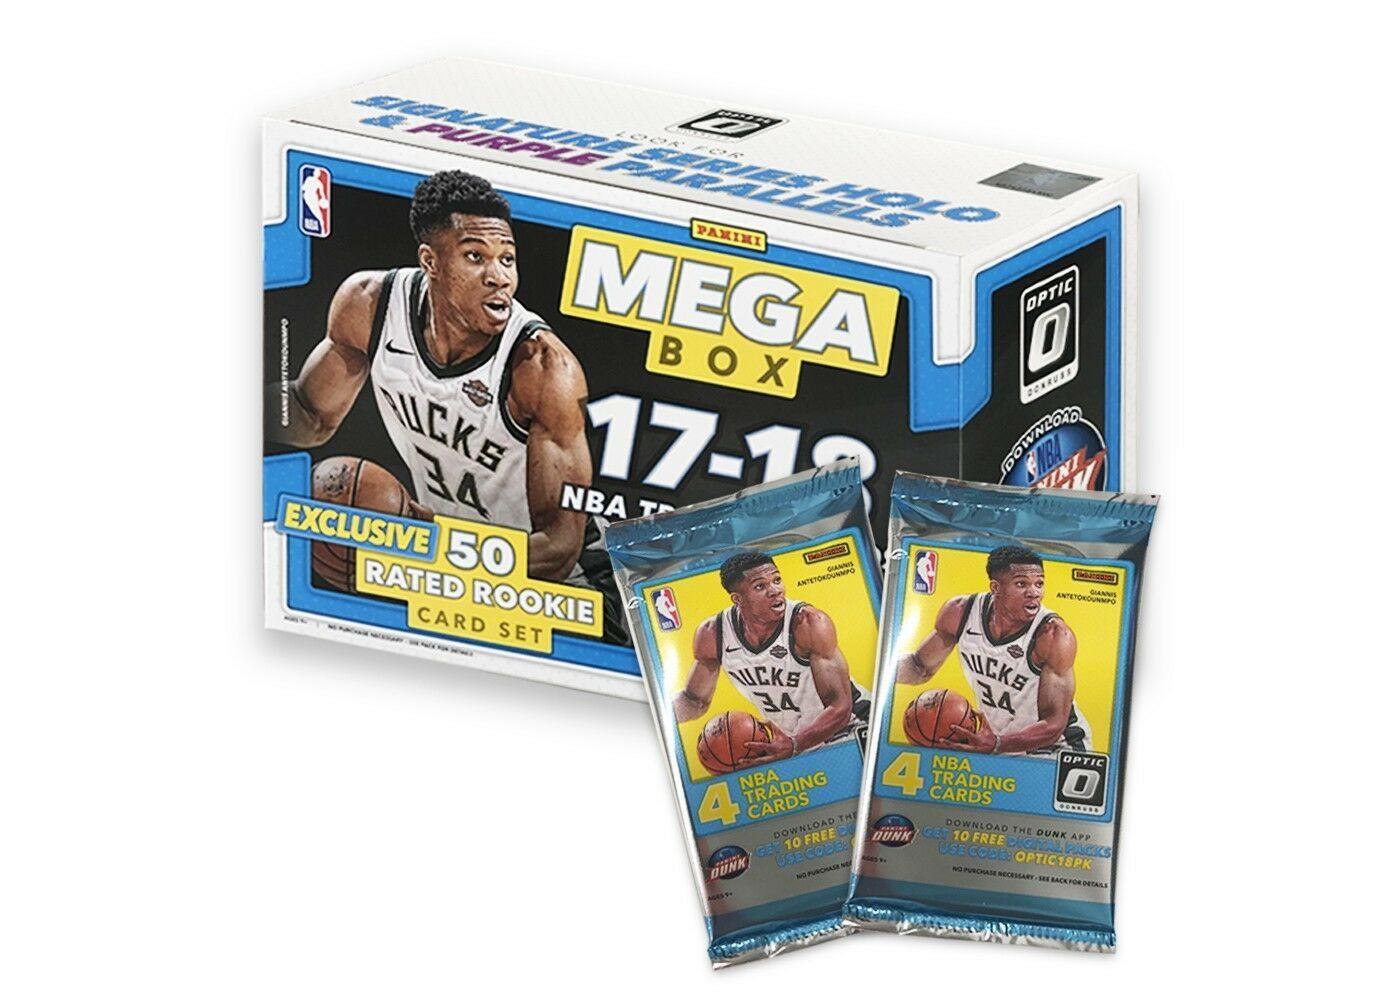 2017-18 Panini Prizm NBA Basketball MEGA BOX SEALED 50 Rated Rookie Card